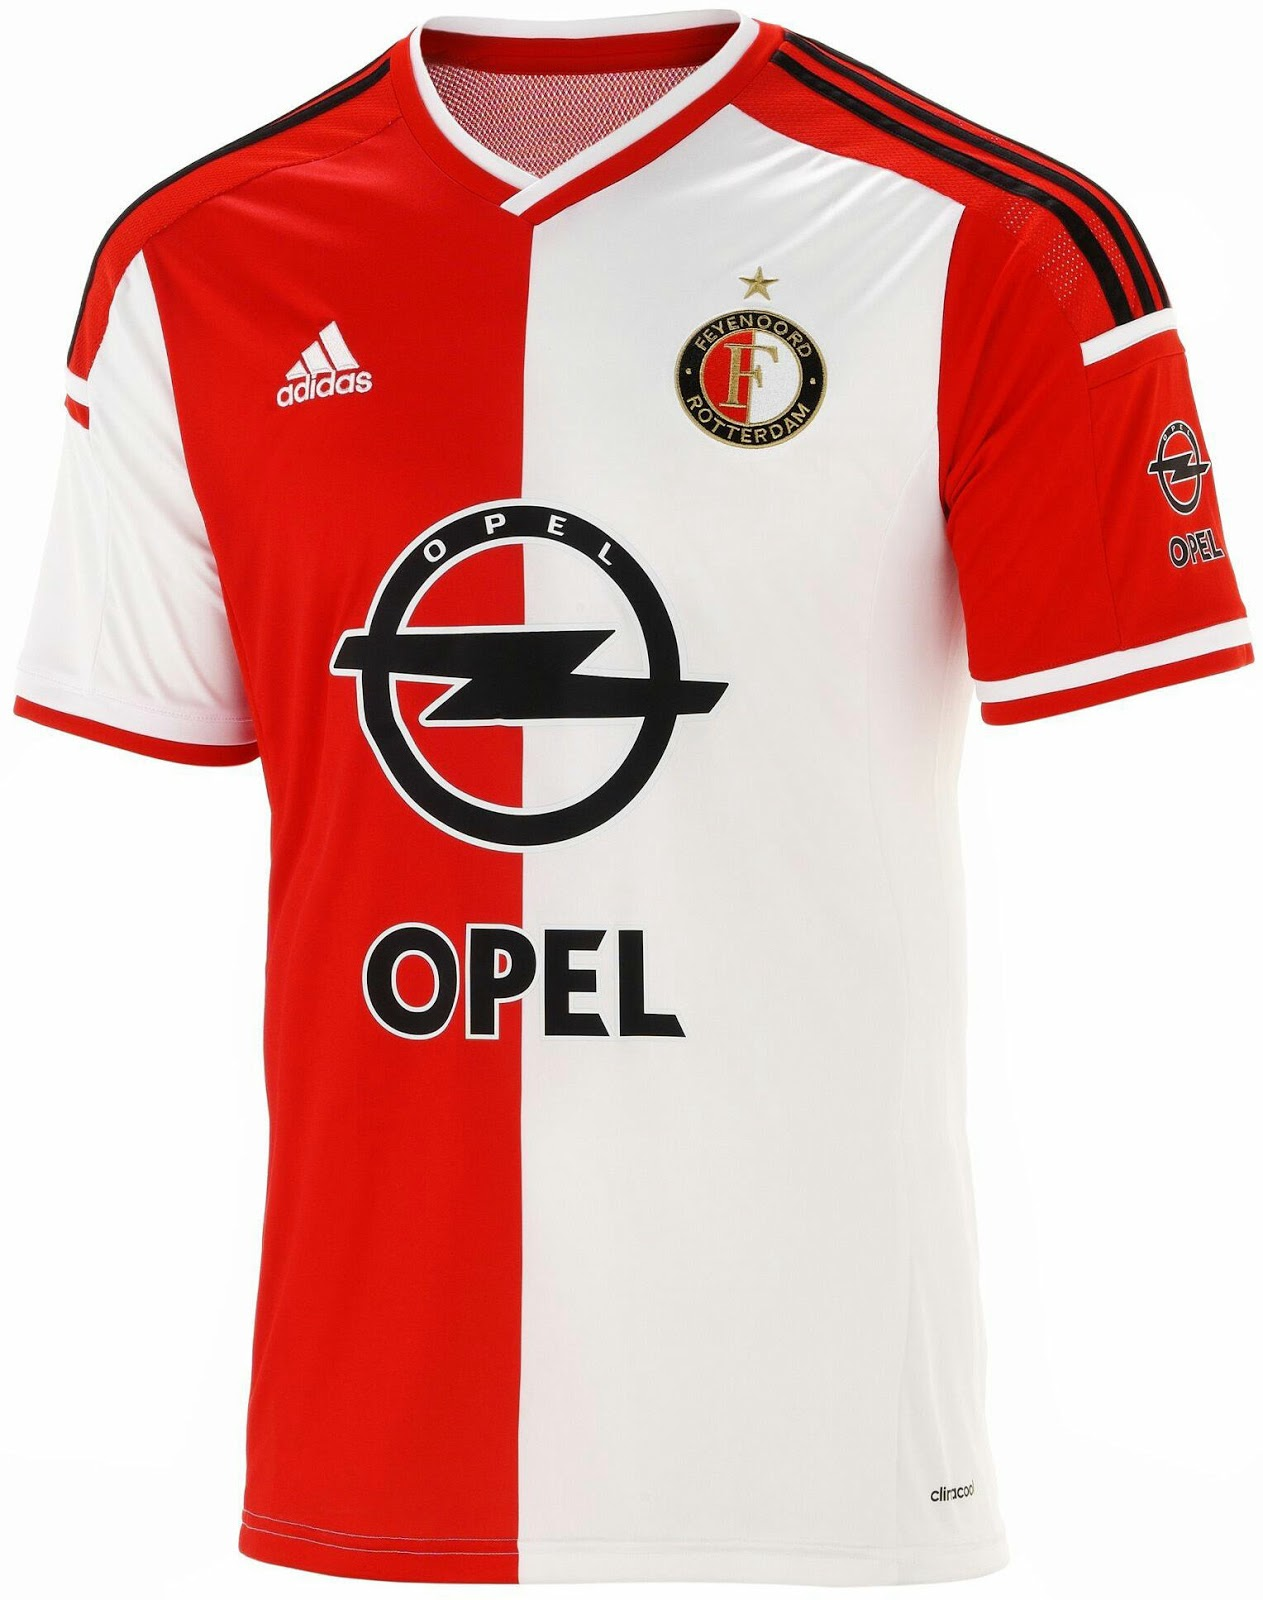 New Adidas Feyenoord 14-15 Kits Released